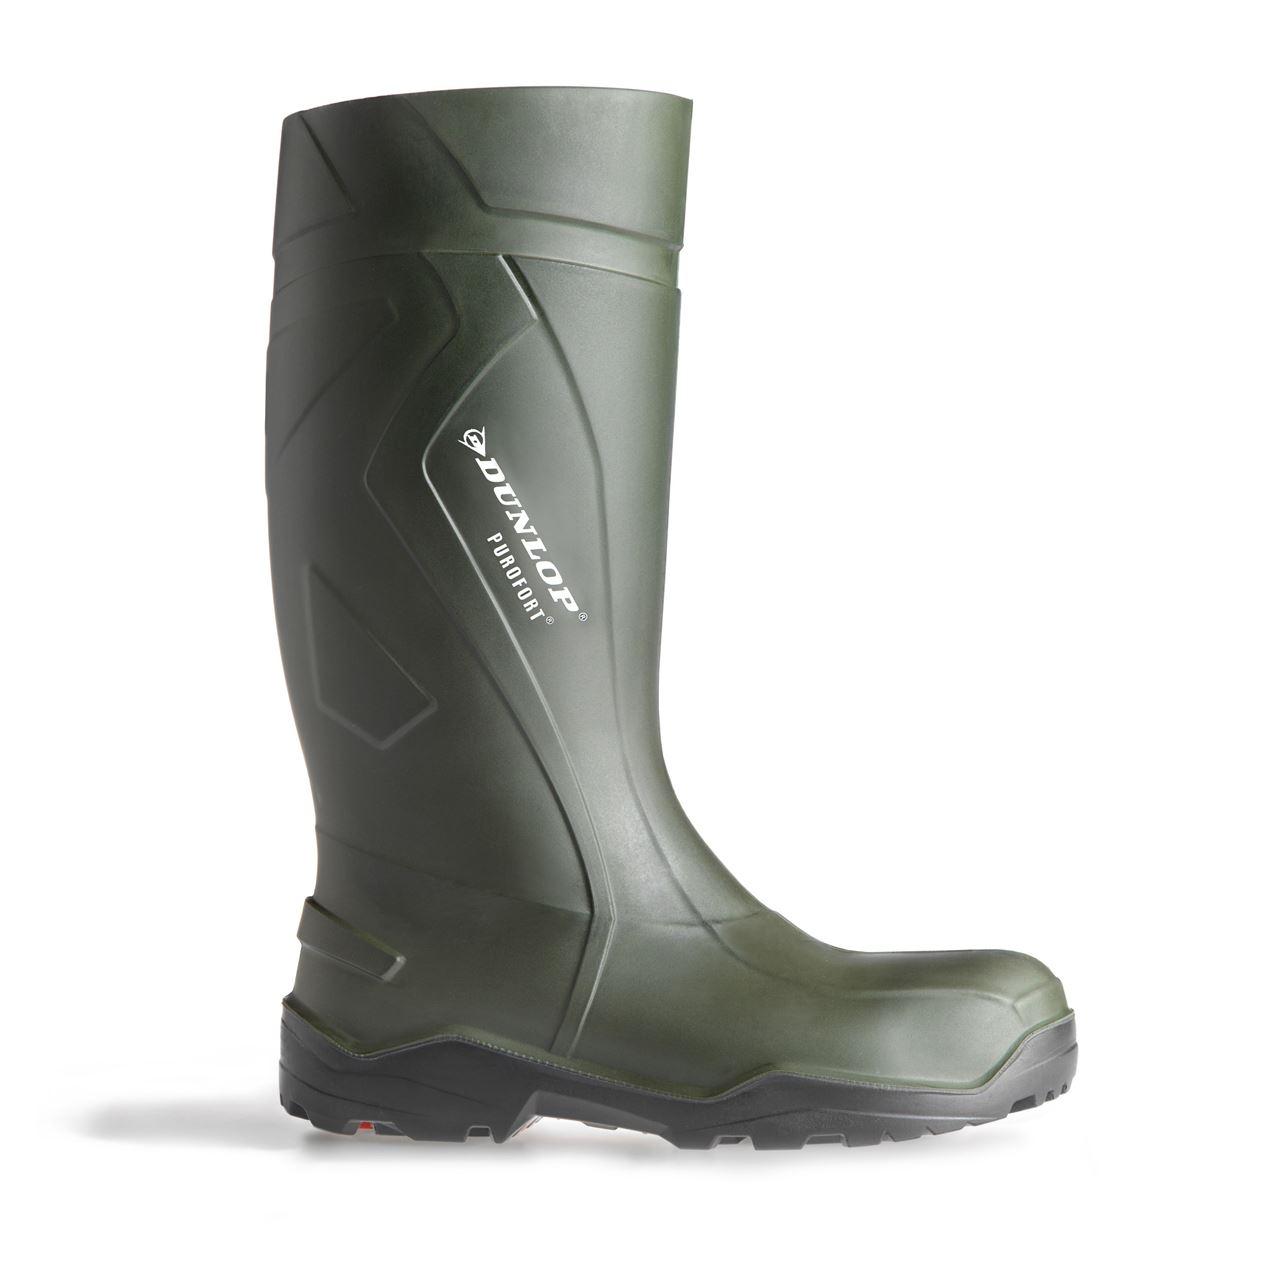 dd085bdb03f Dunlop Safety Wellington Boots